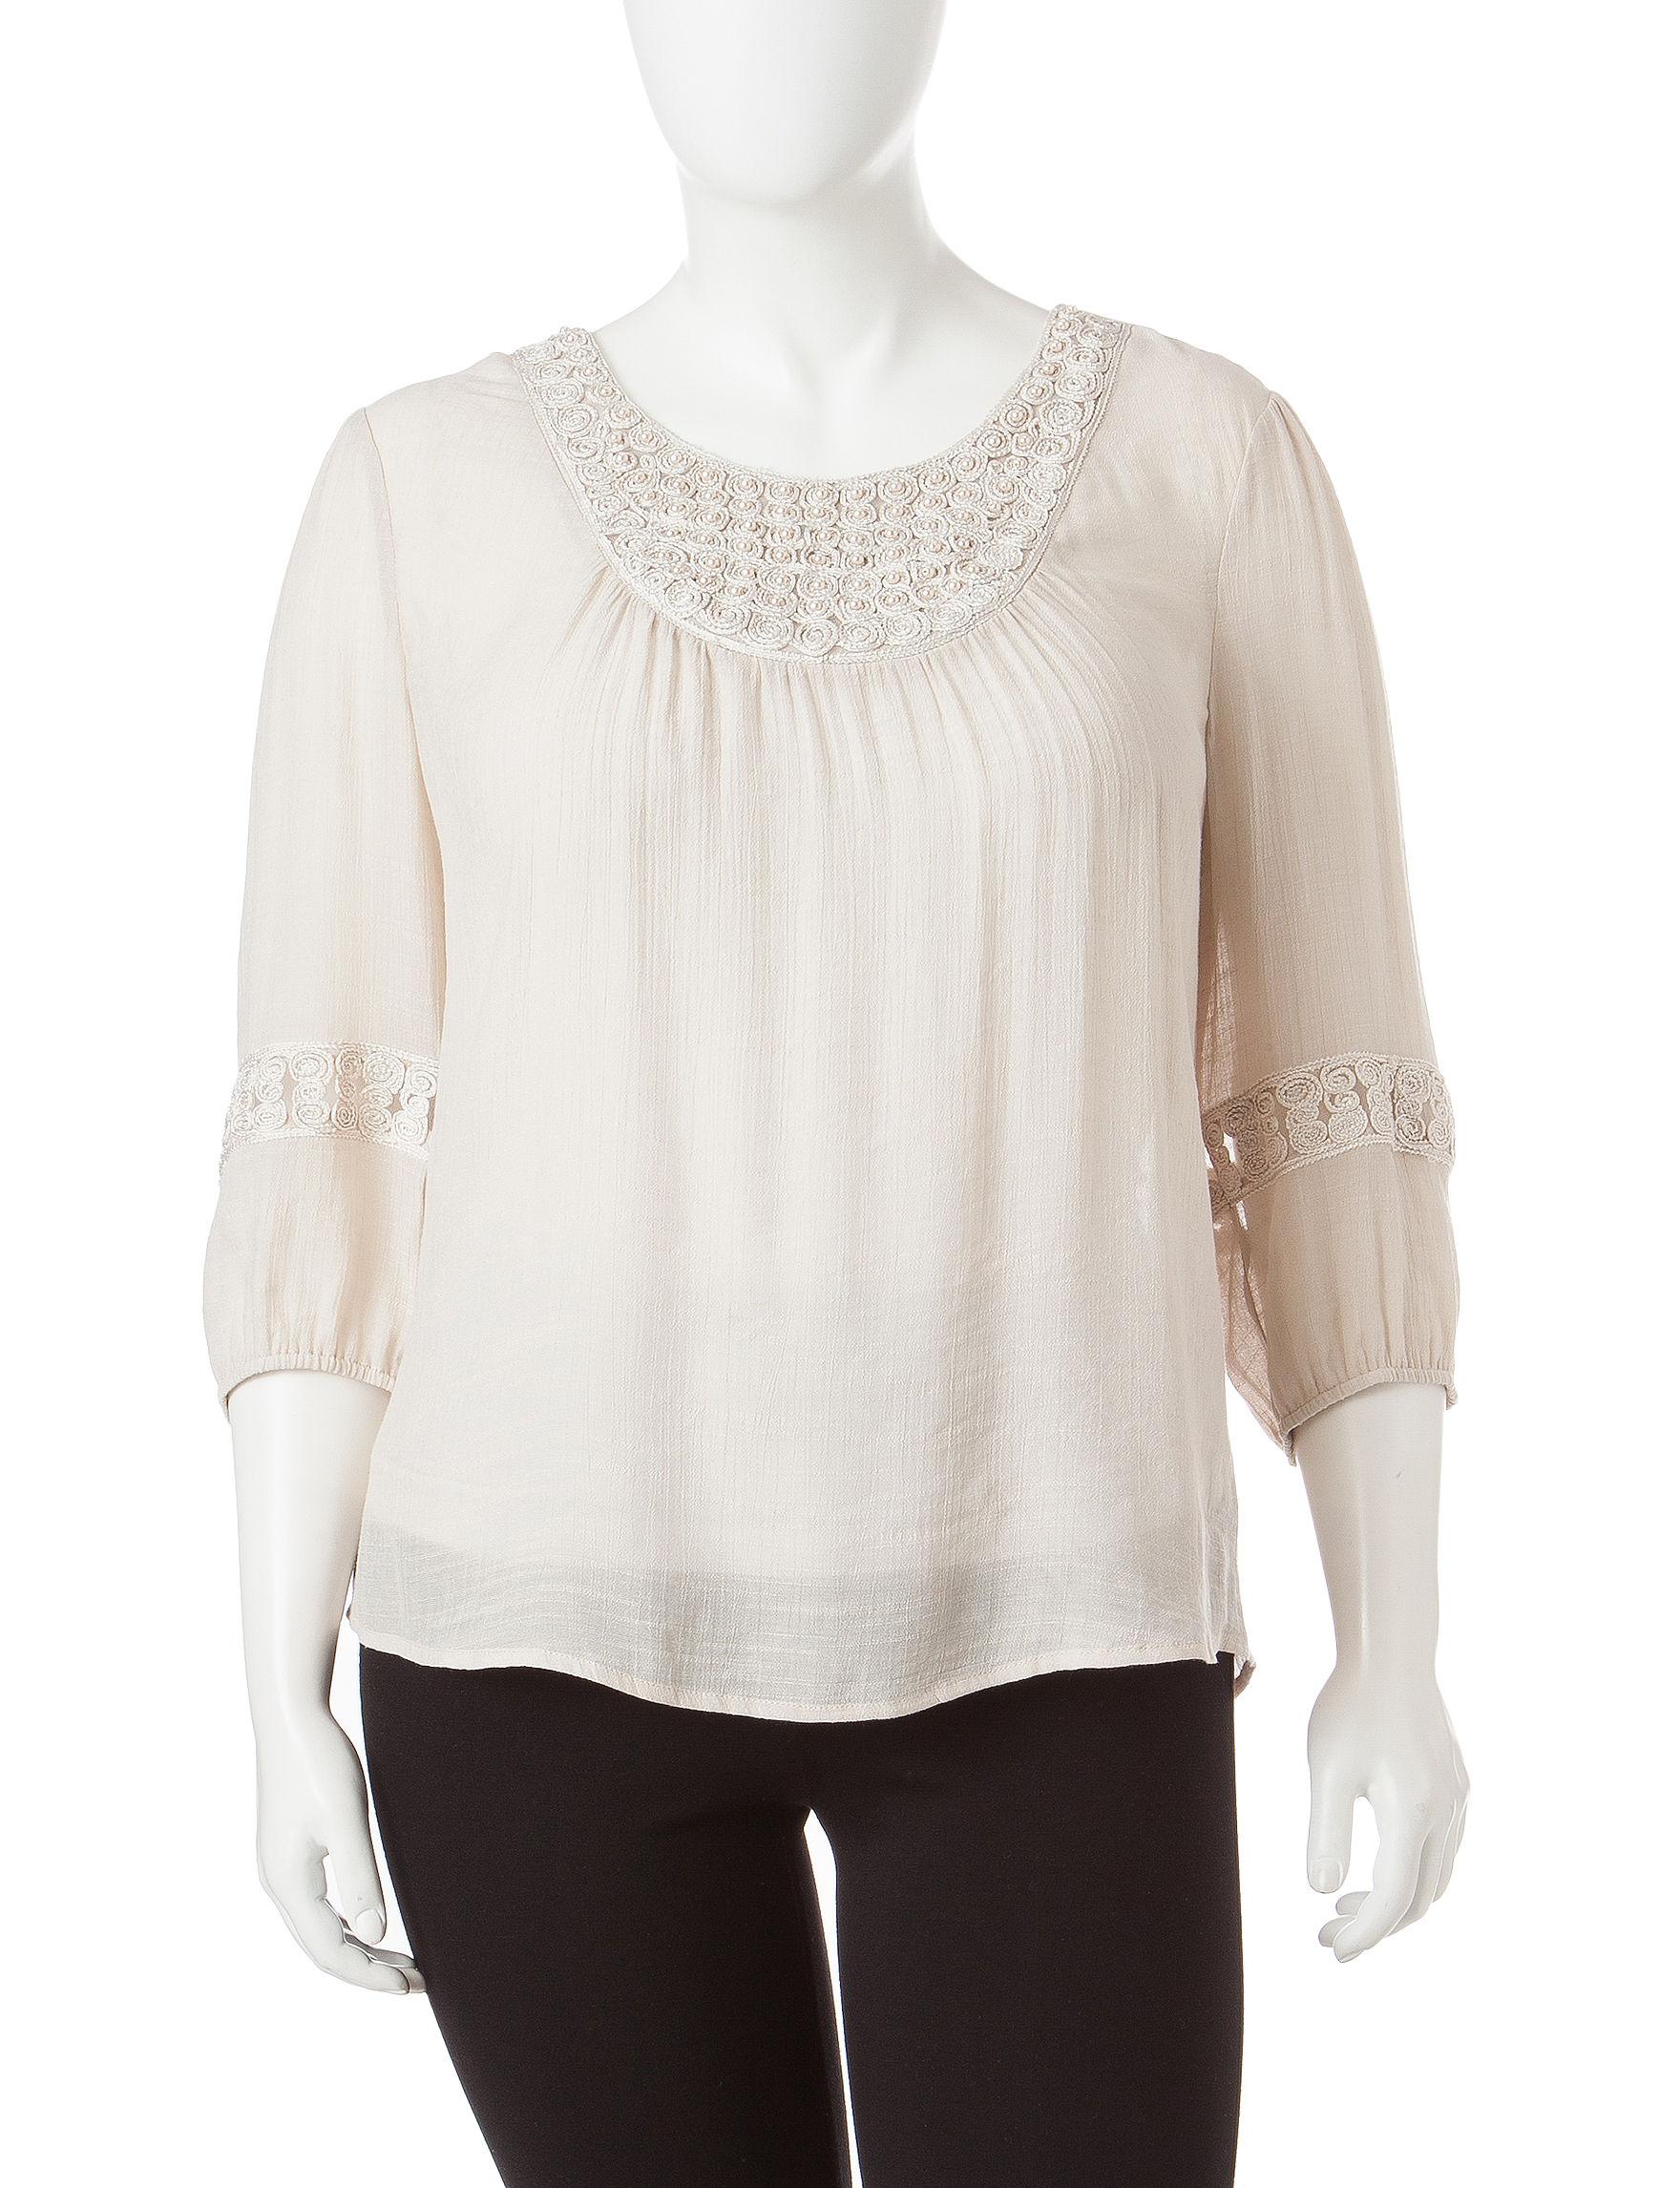 Hannah Taupe Shirts & Blouses